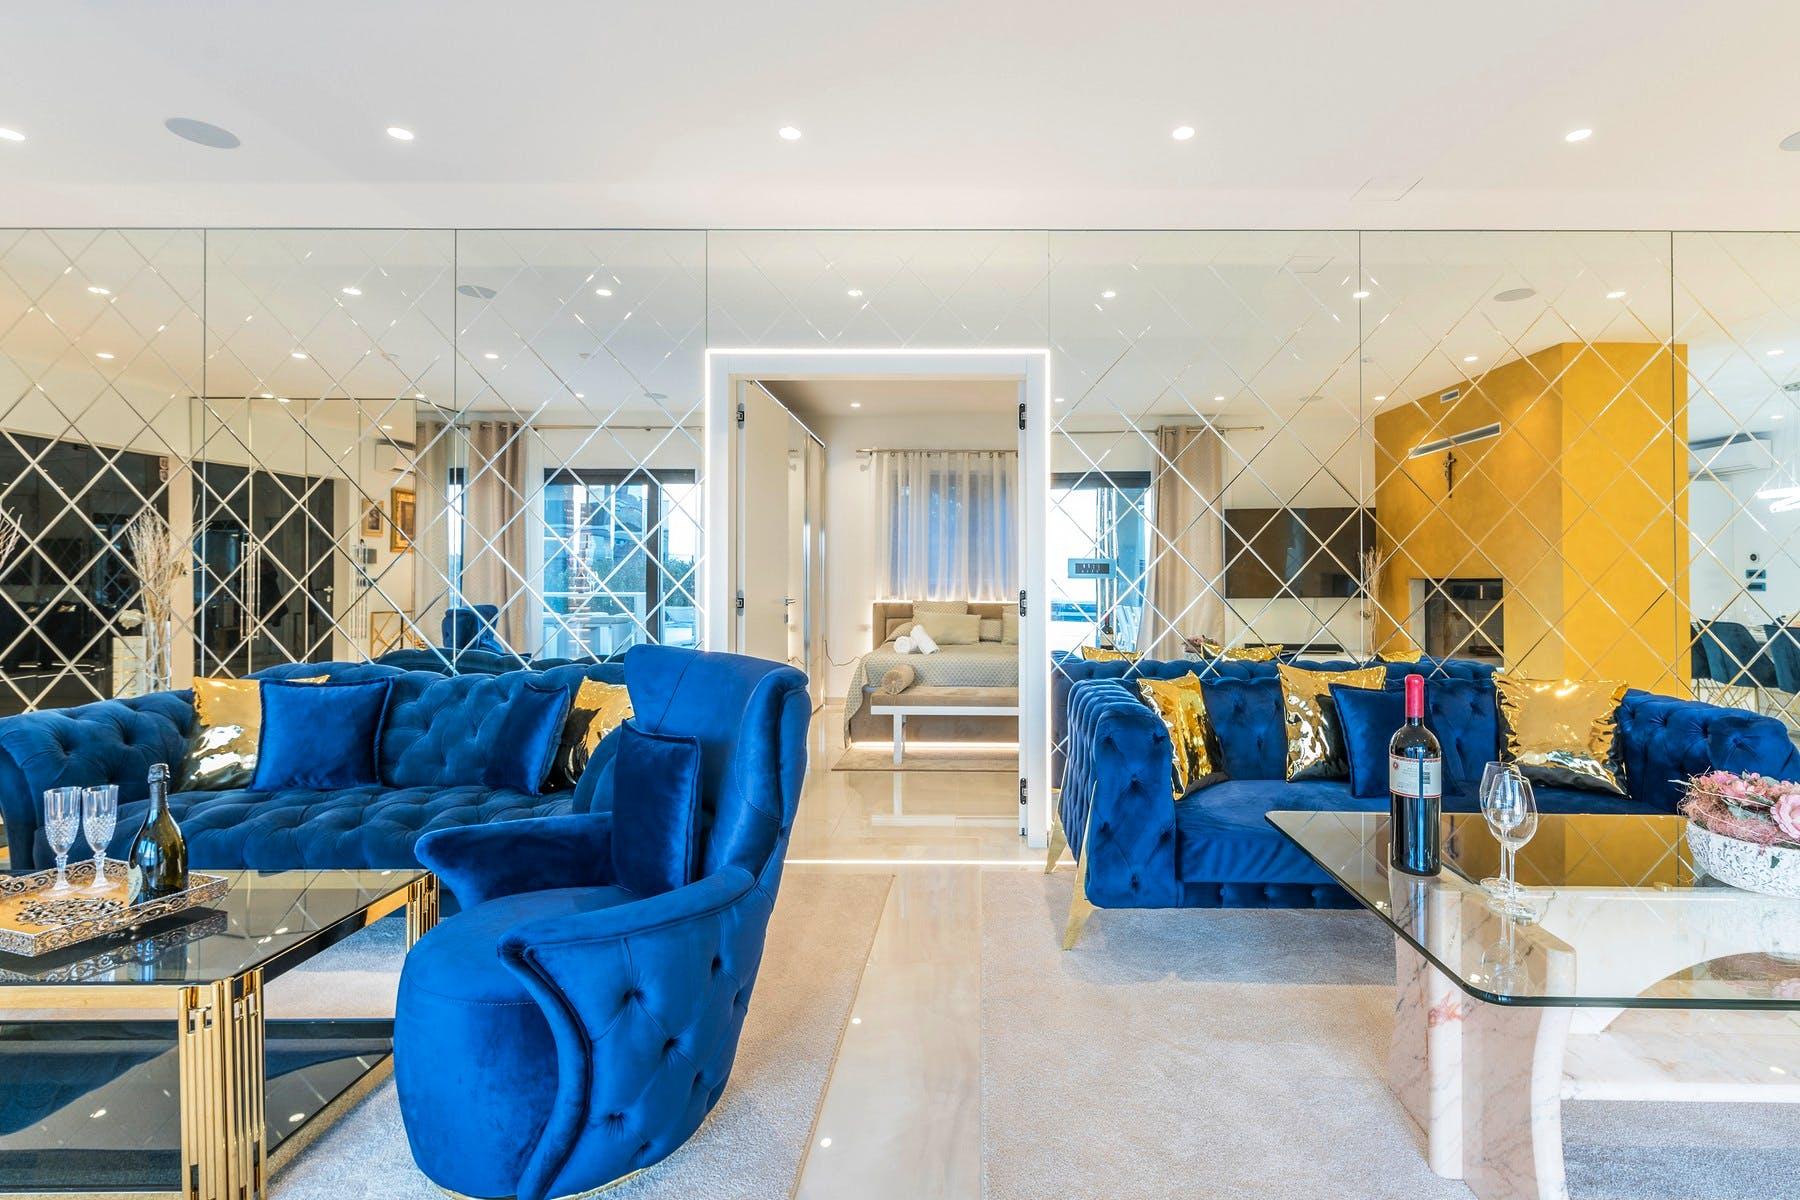 Glamorous interior enhanced by blue sofa